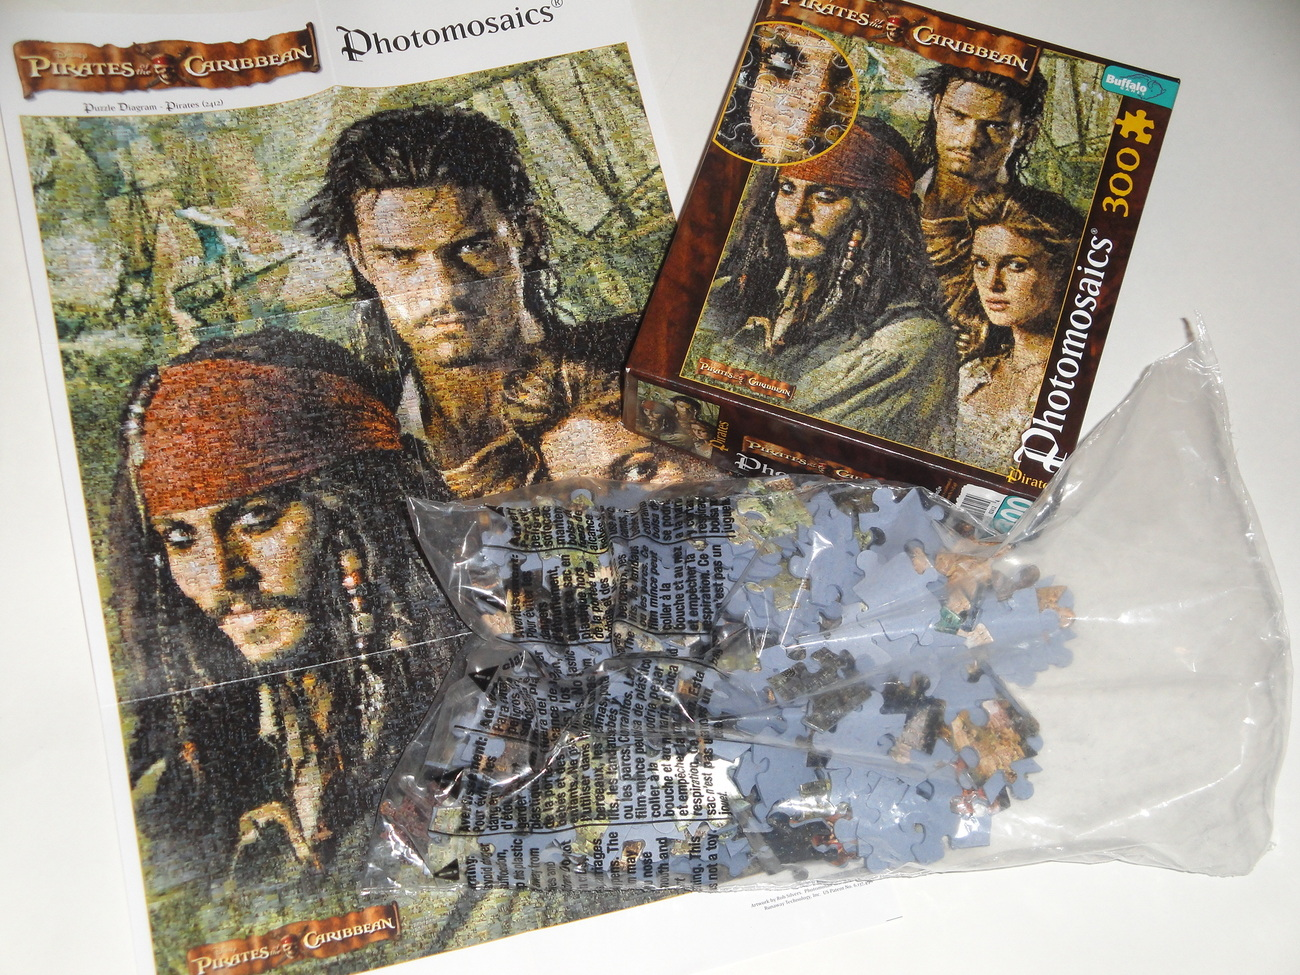 Photomosaic Pirates of the Caribbean 300 Piece Puzzle.